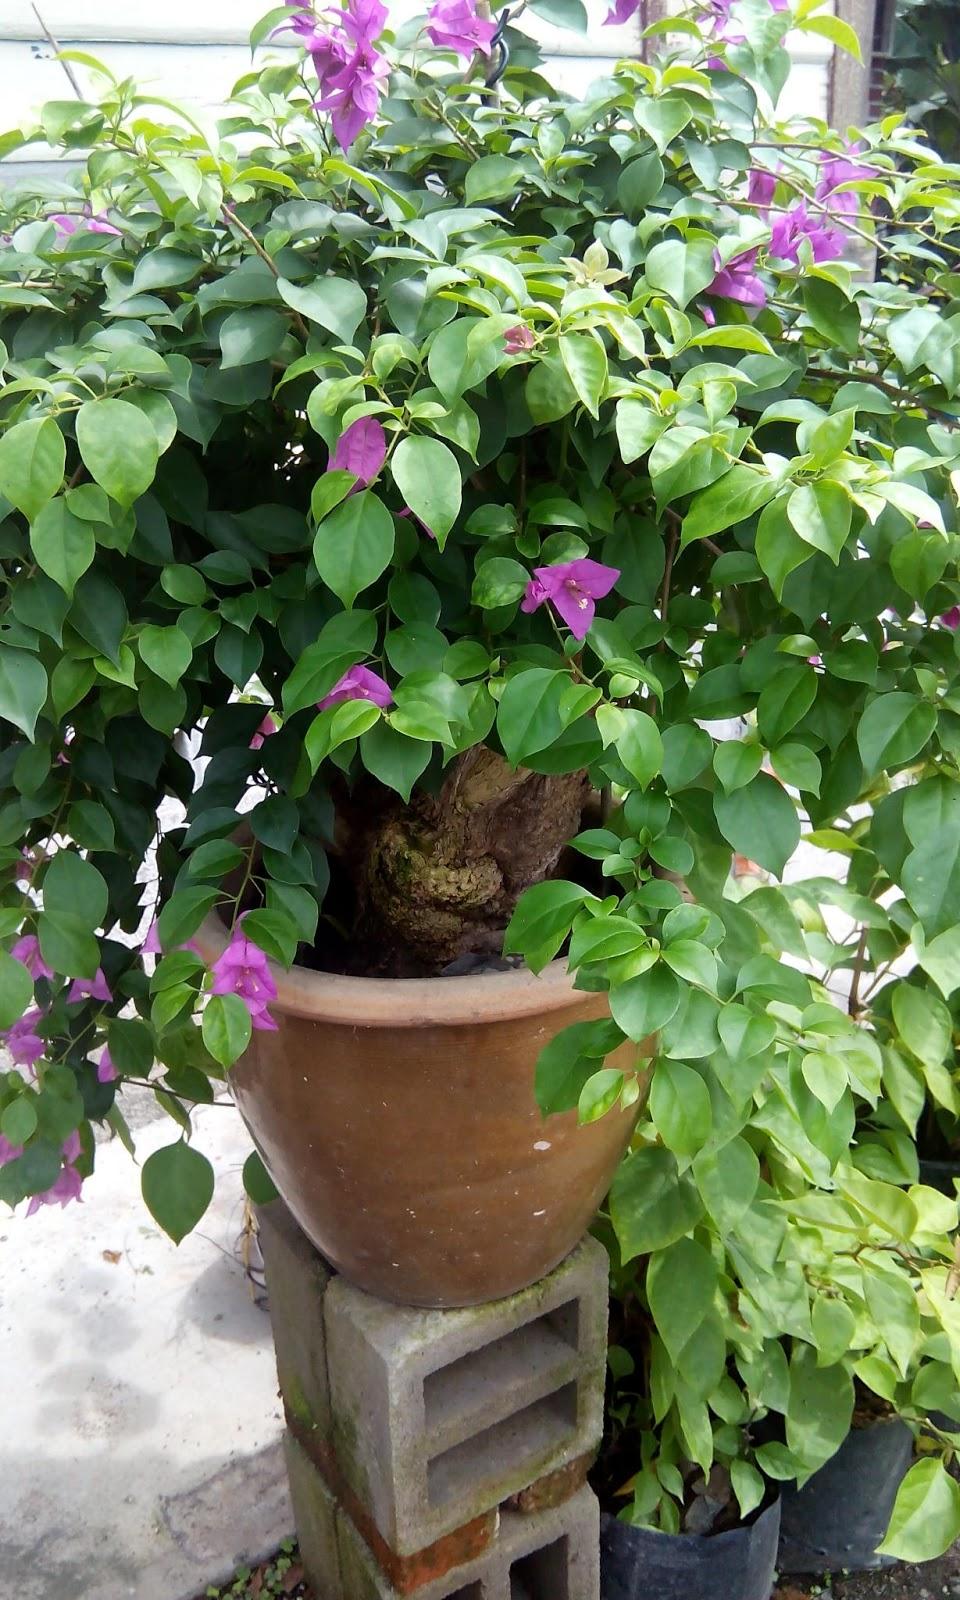 Hasil Observasi Tanaman Bunga Kertas Informasi Seputar Tanaman Hias